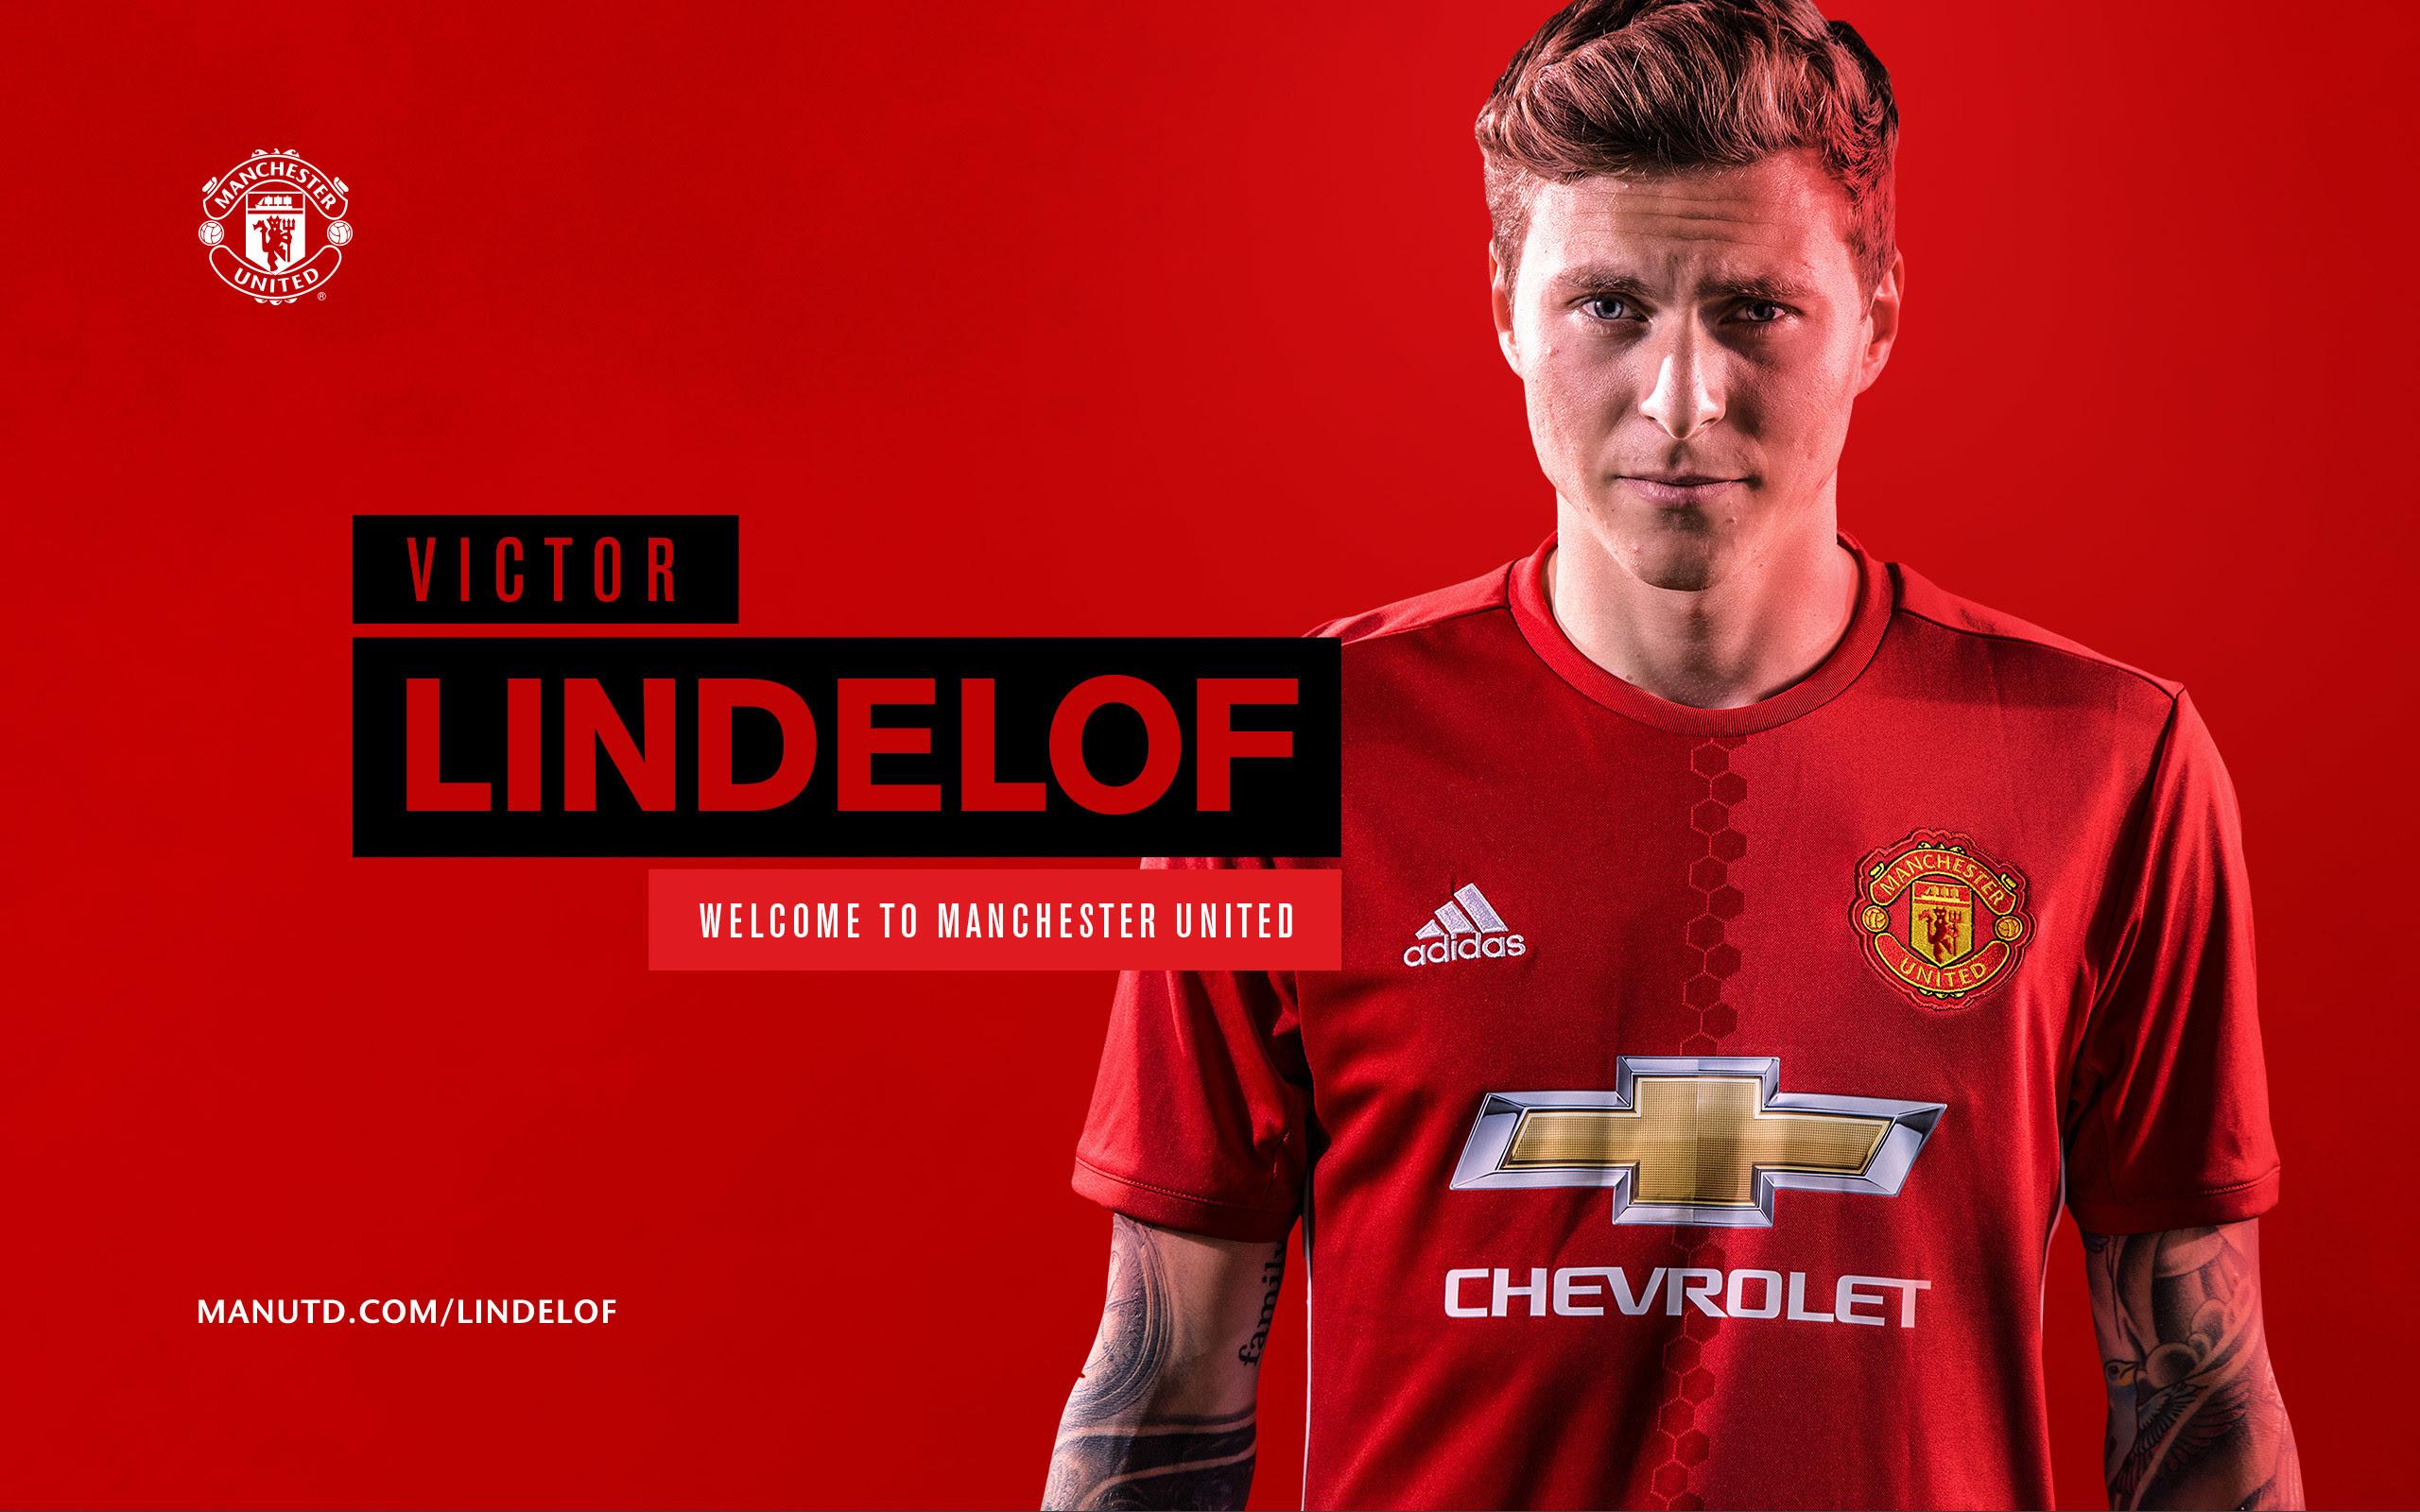 Manchester United Wallpaper Manchester City Vs Manchester